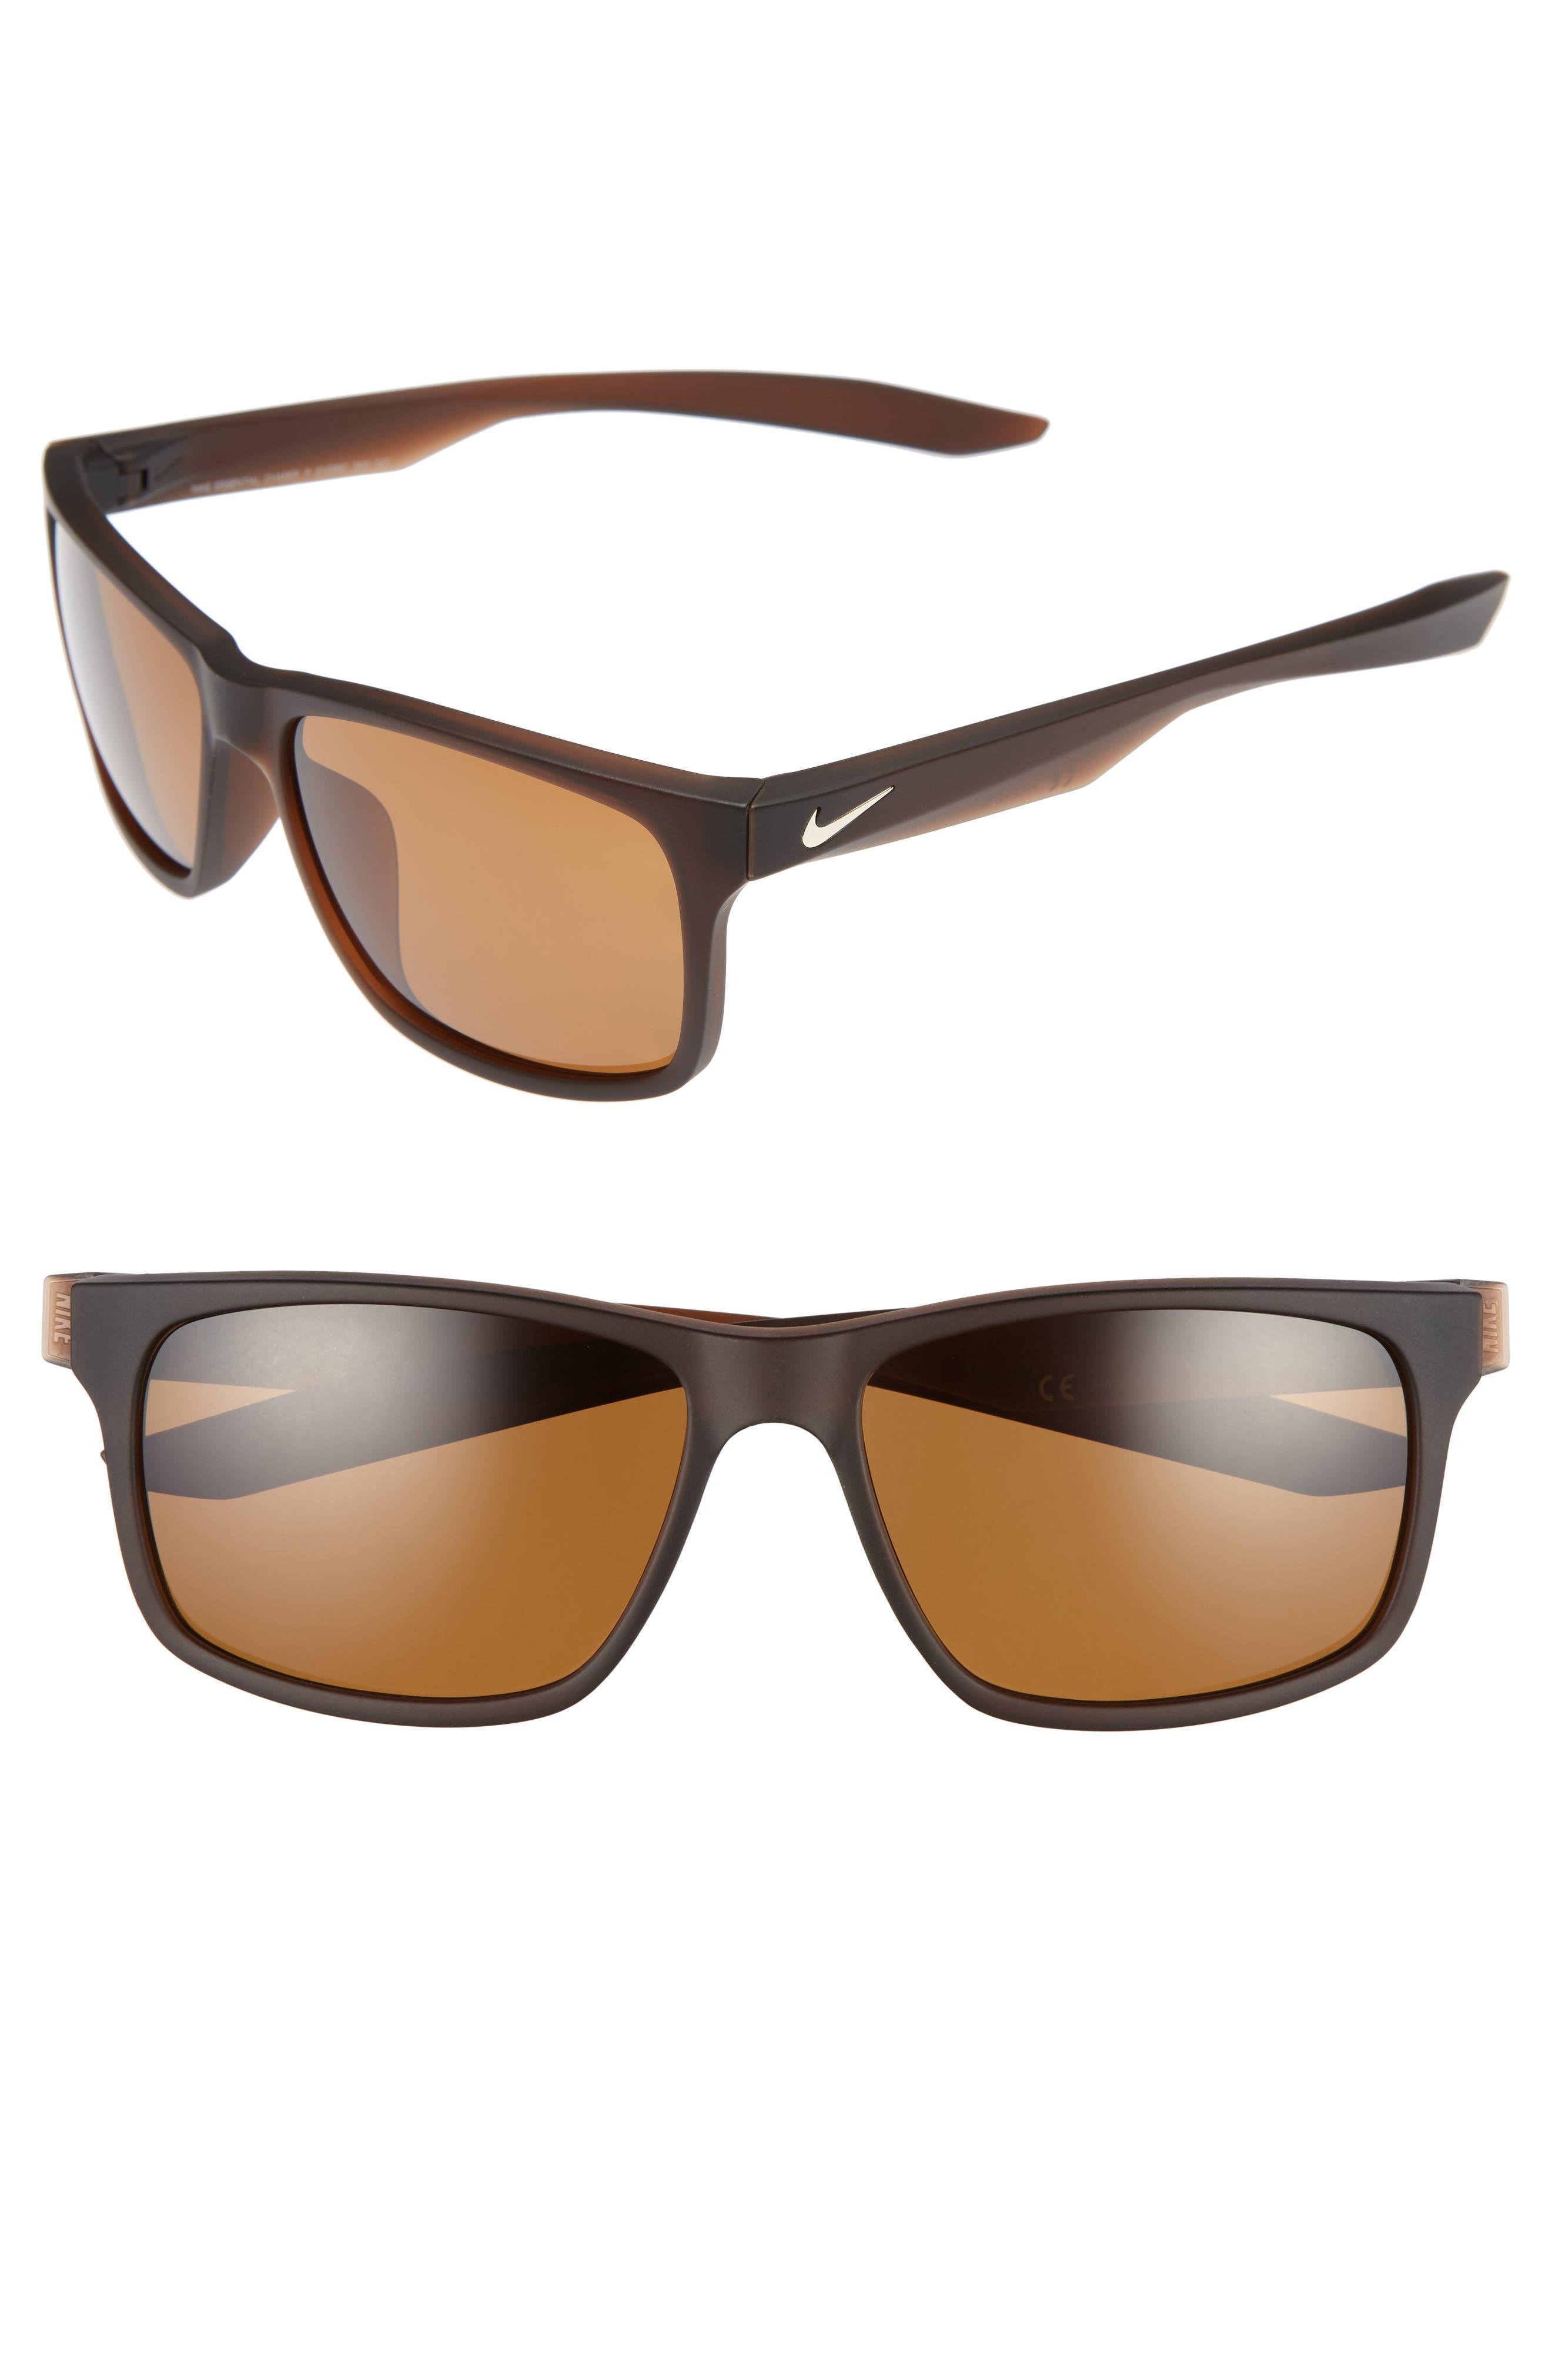 Nike Unrest 57Mm Polarized Sunglasses - Matte Black  Deep Pewter In ... eba1a4fabf